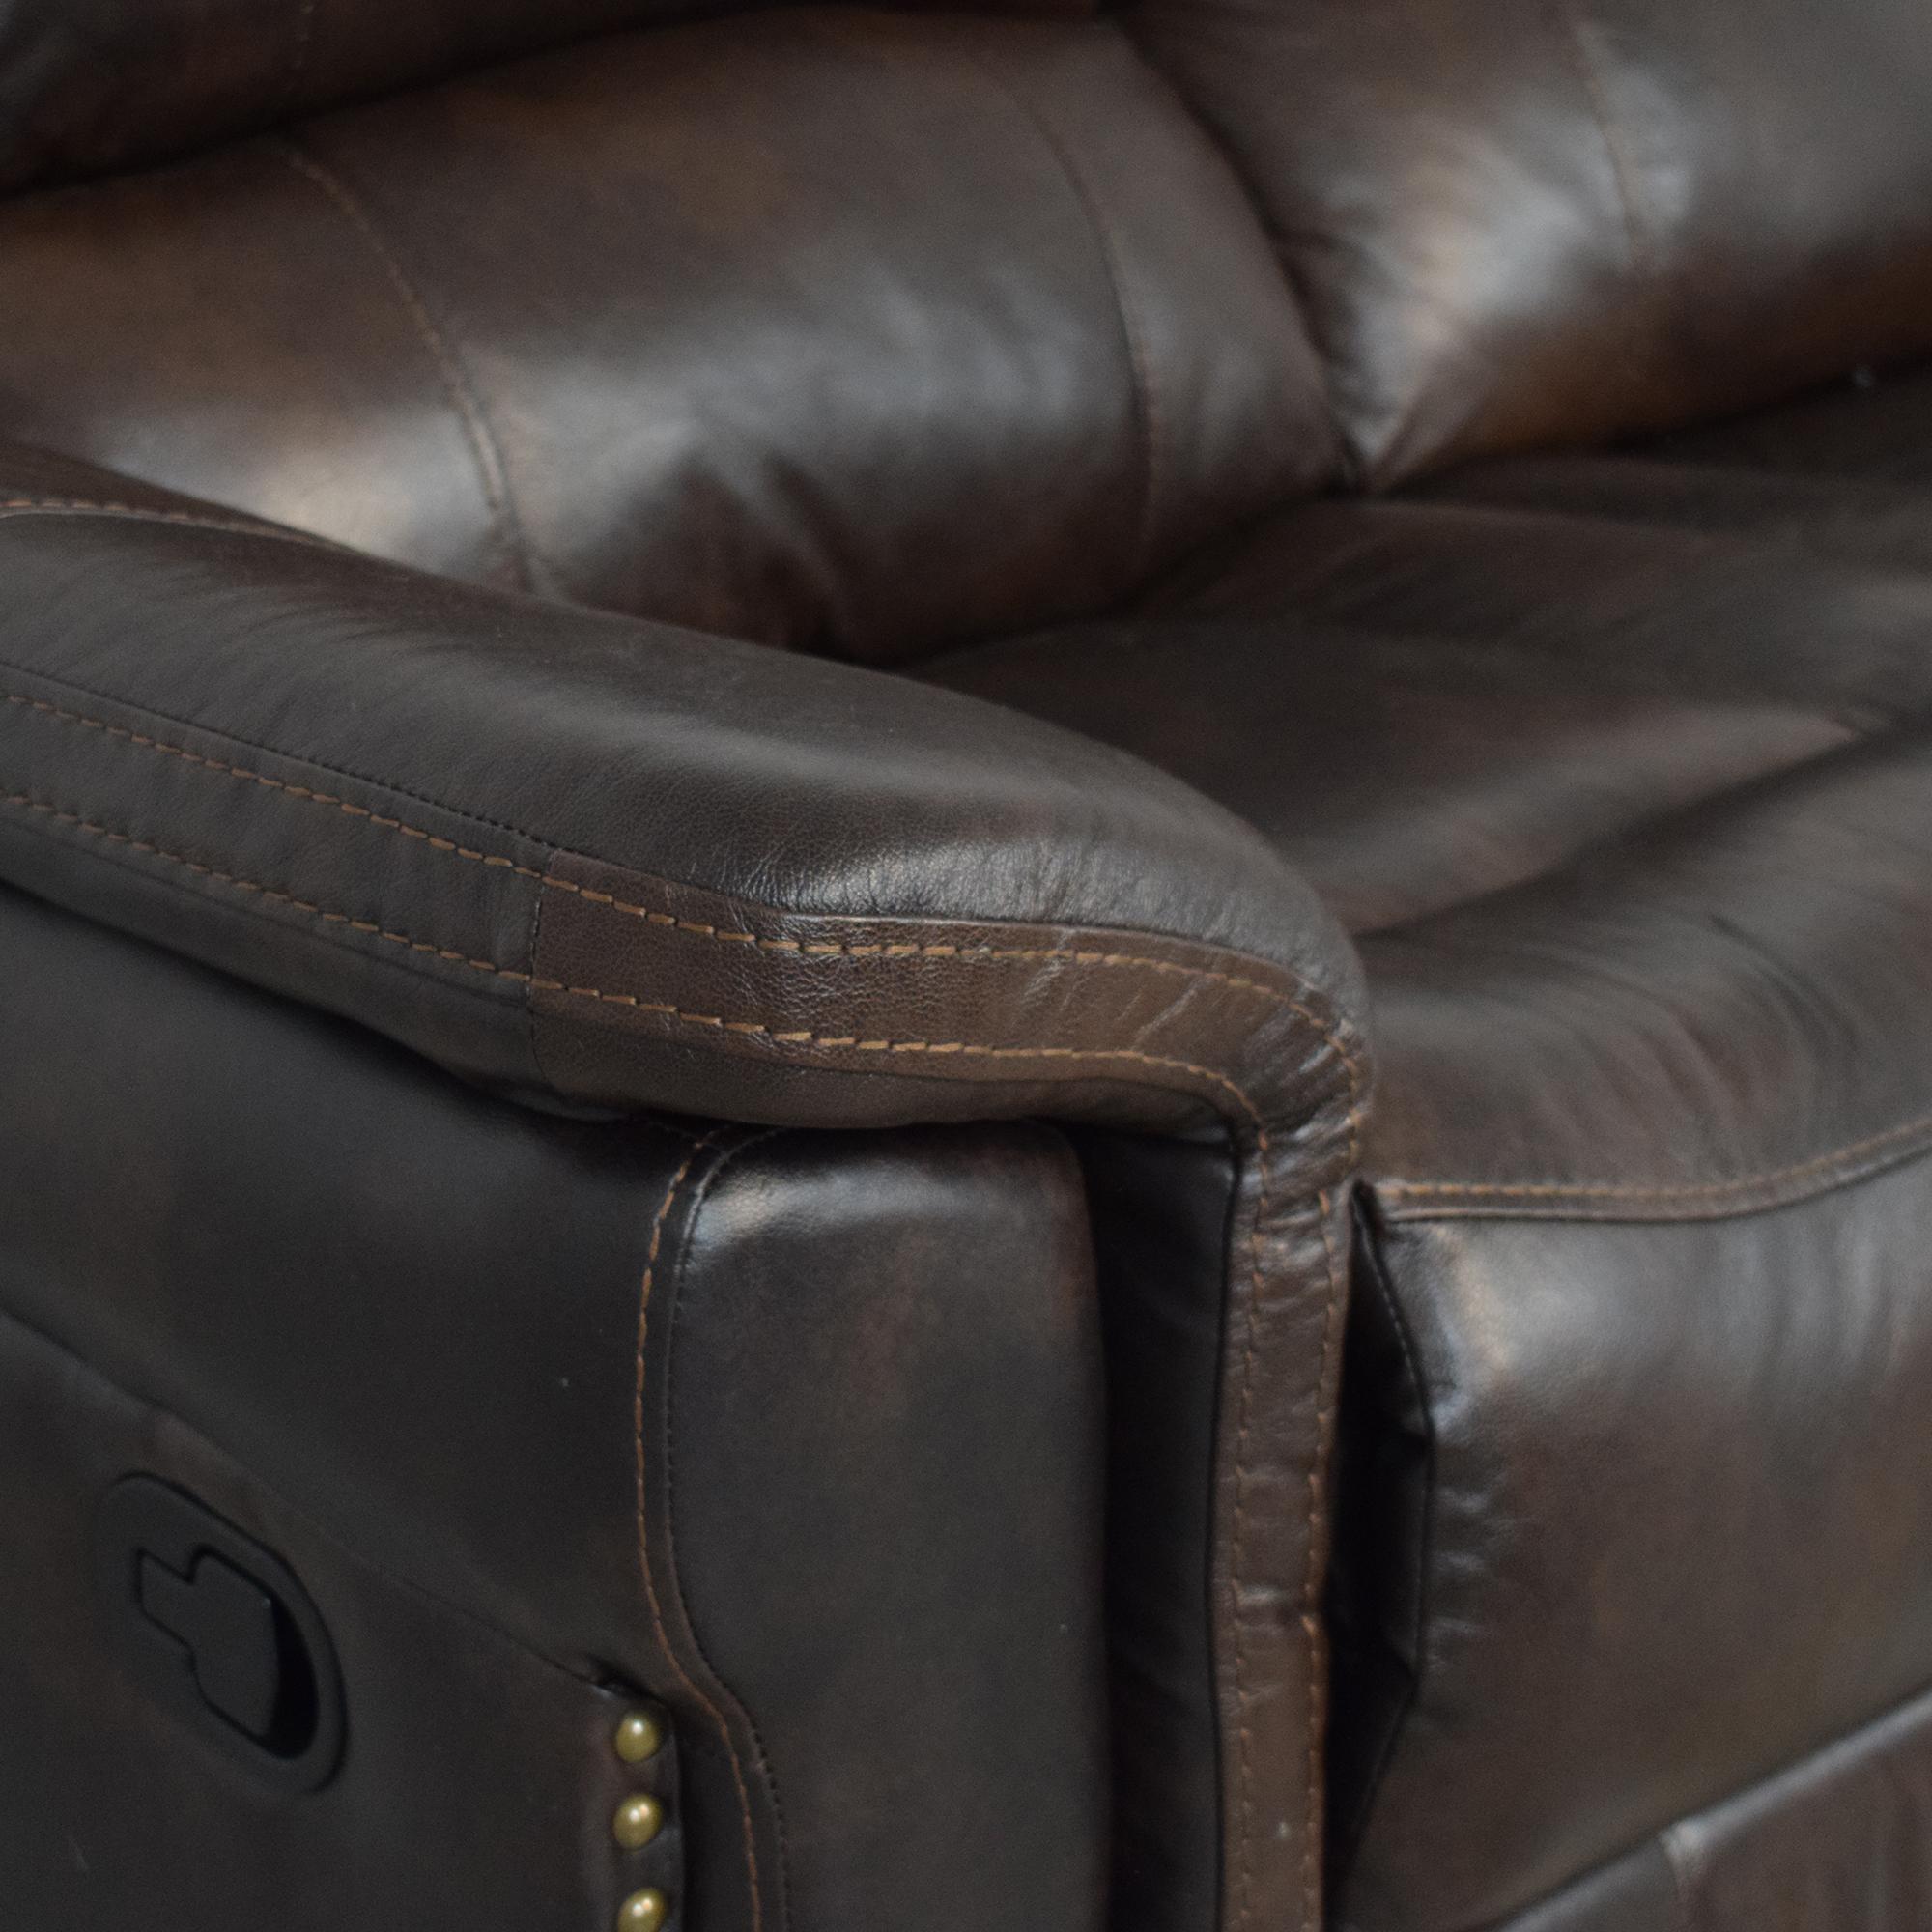 Delancey Street Furniture Recliner Sofa used